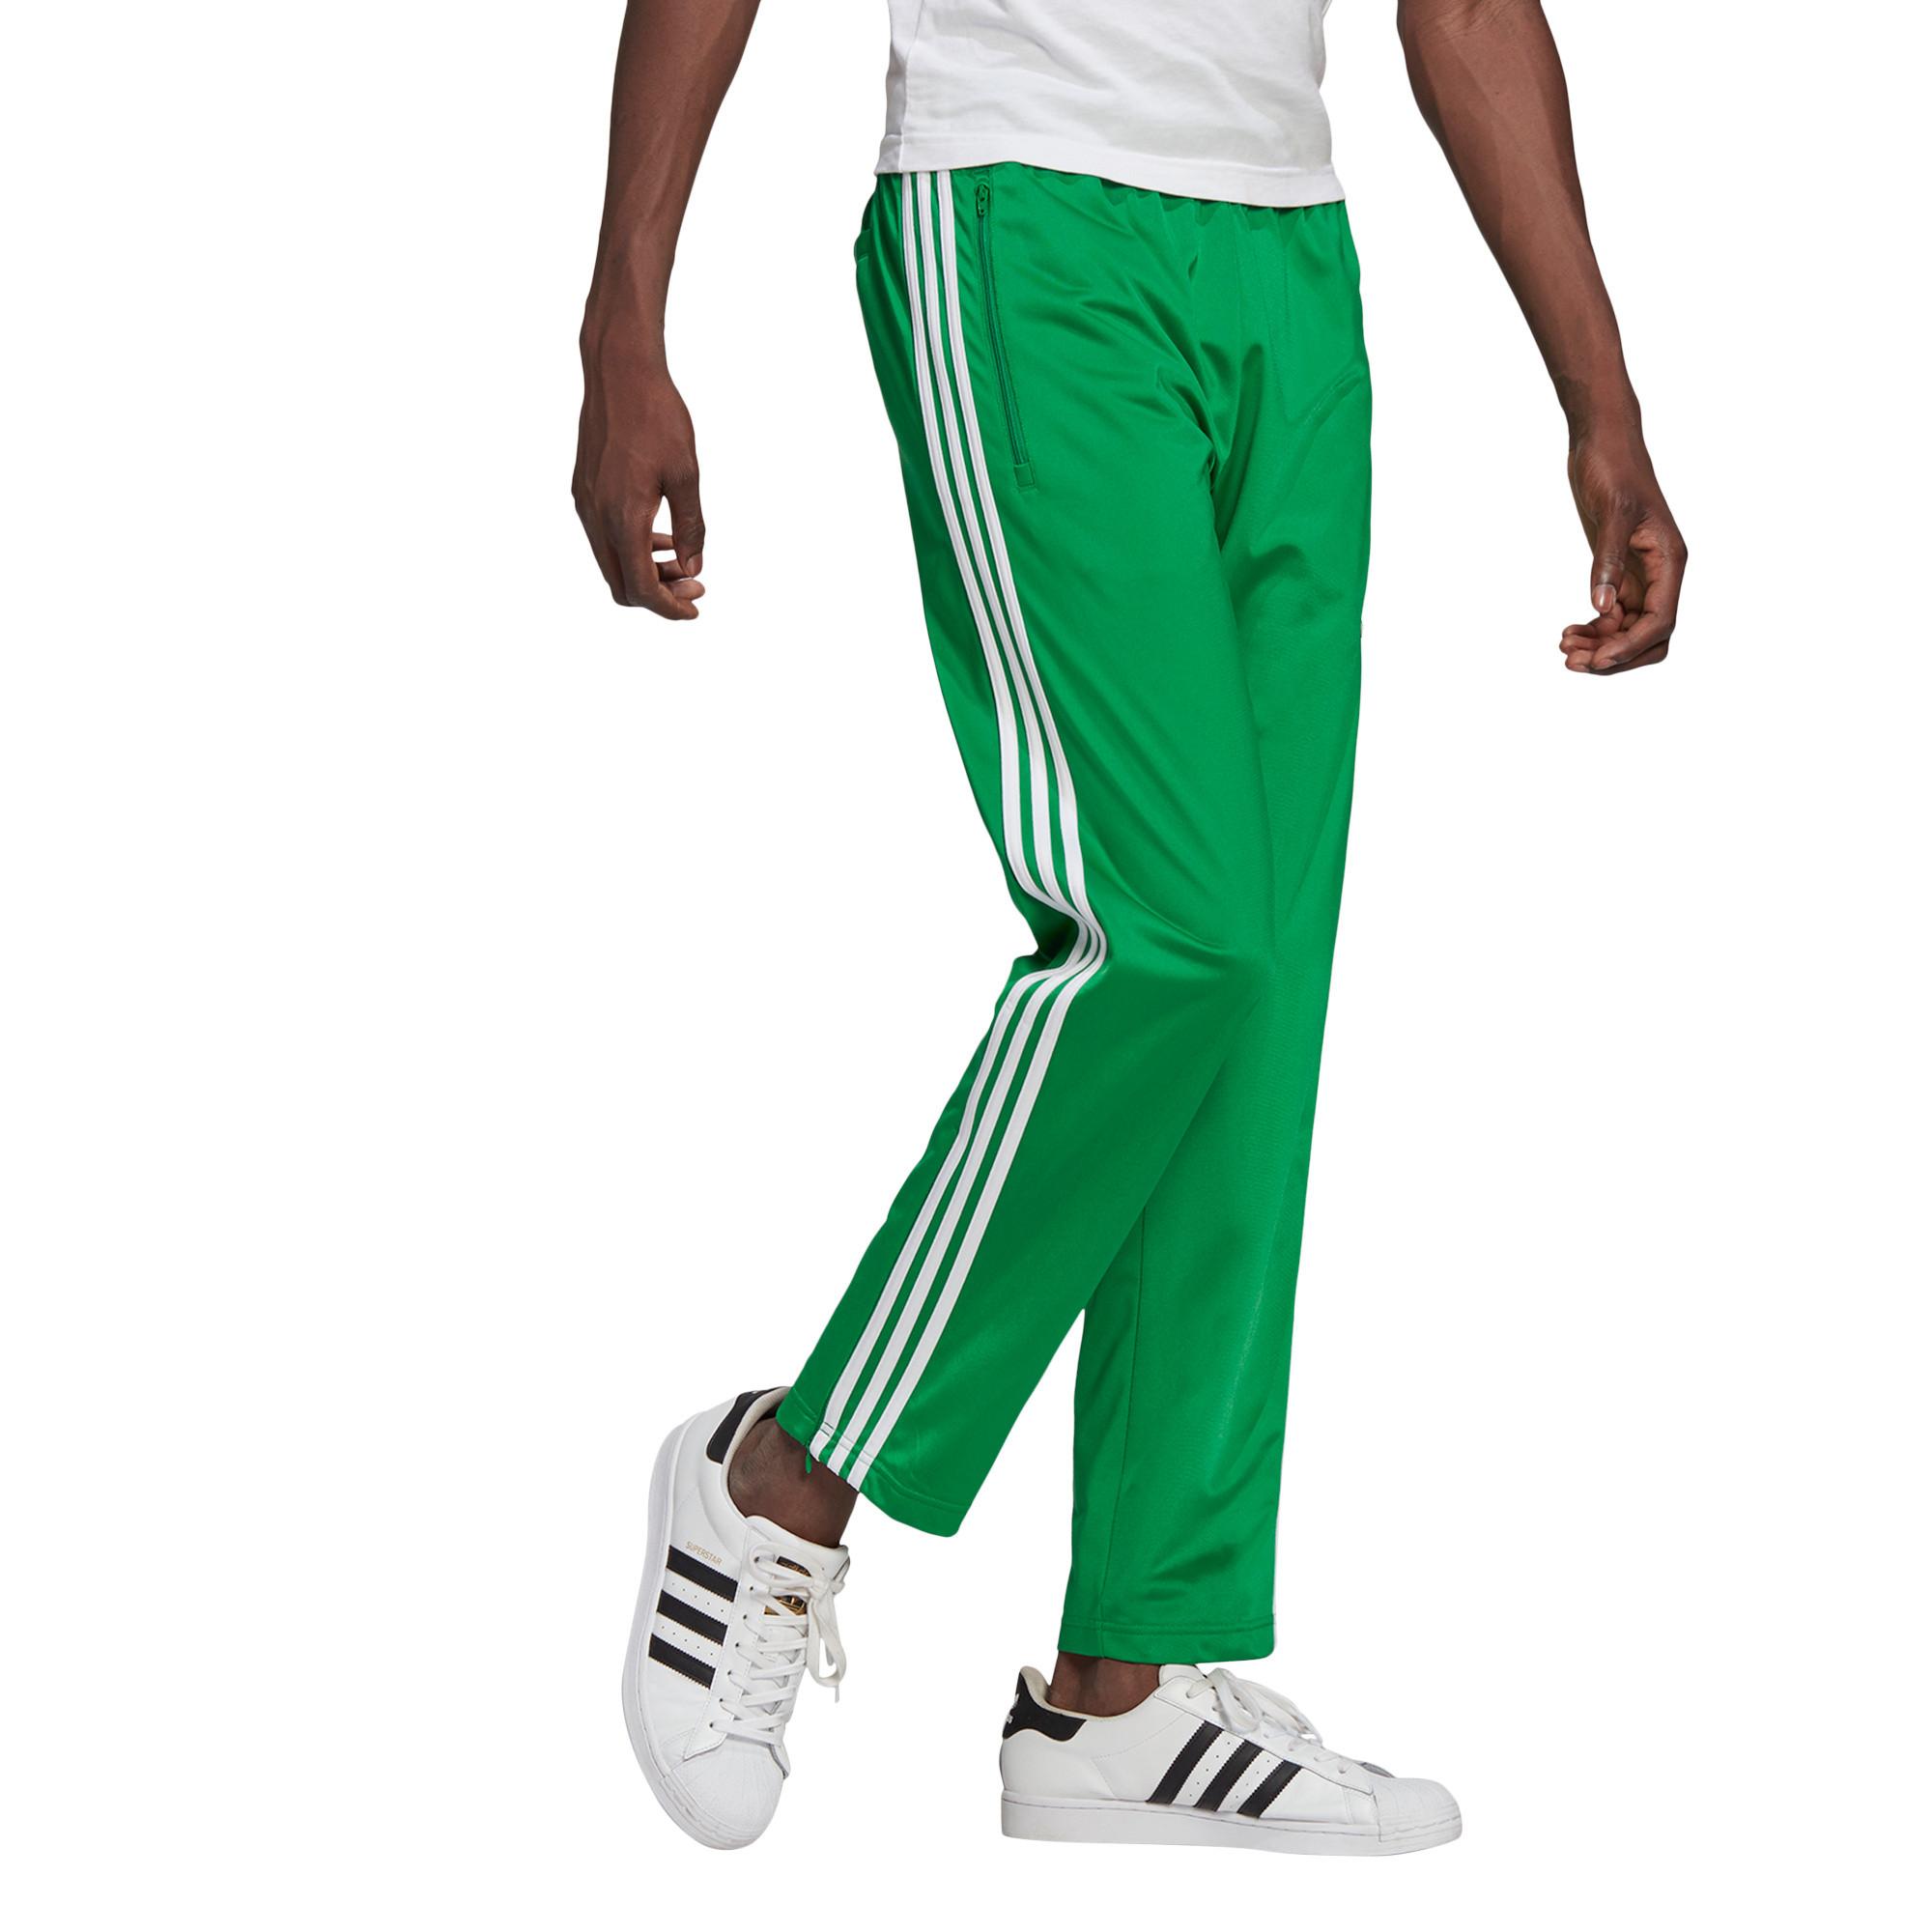 Pantaloni tuta adicolor classics, Verde, large image number 2